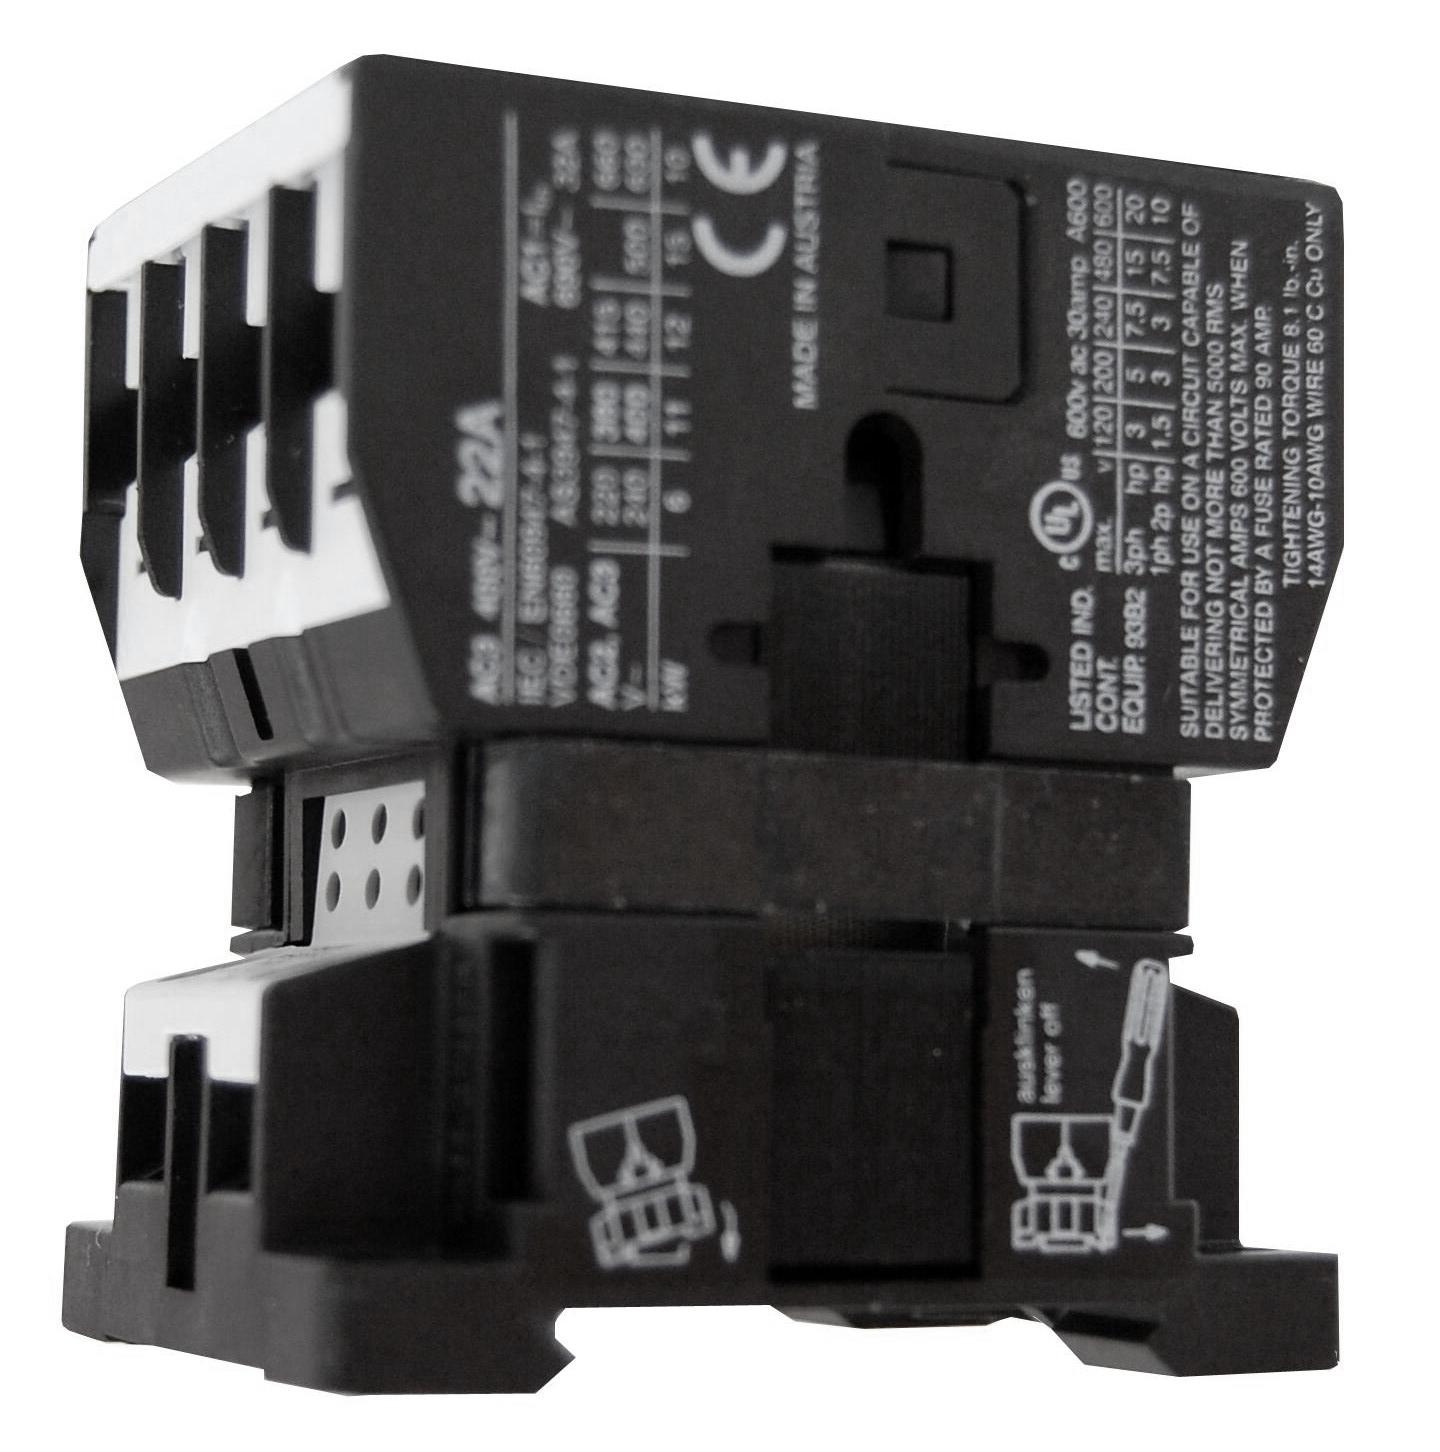 LA302223 - Schrack Technik